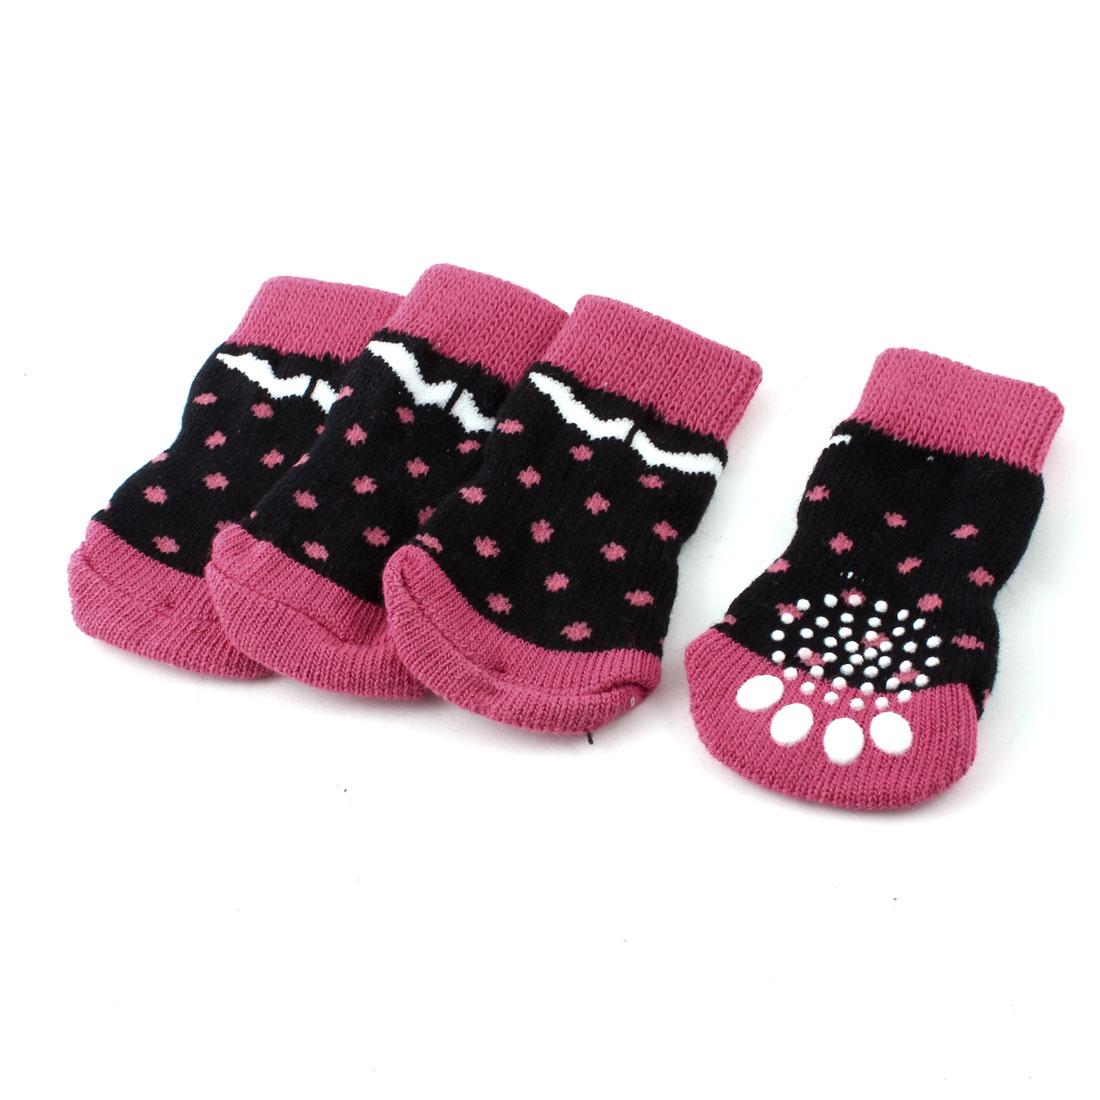 2 Pairs Paw Printed Stretchy Cuff Pet Dog Cat Yorkie Socks Fuchsia Black S